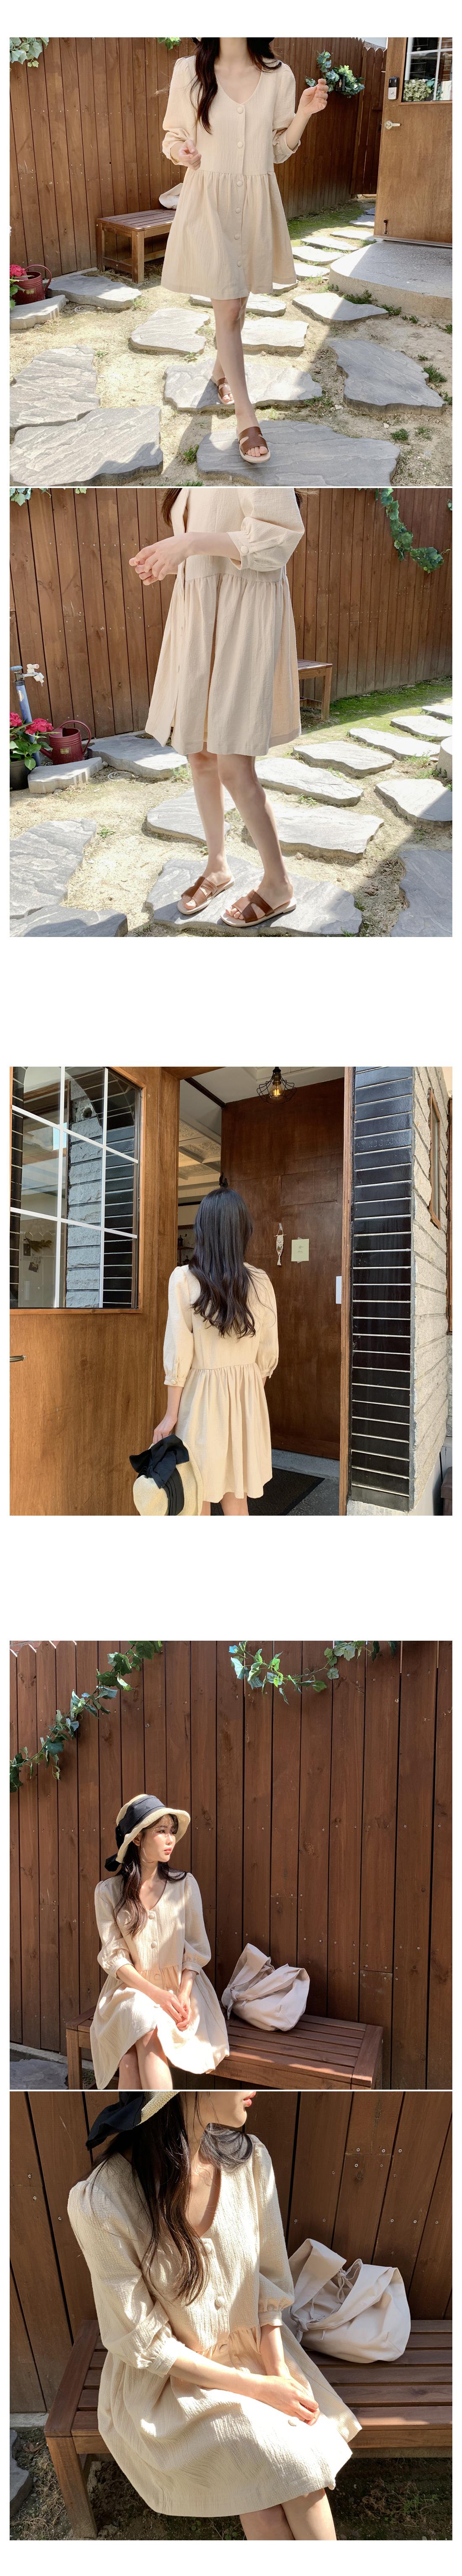 Minute Cotton Mini Dress